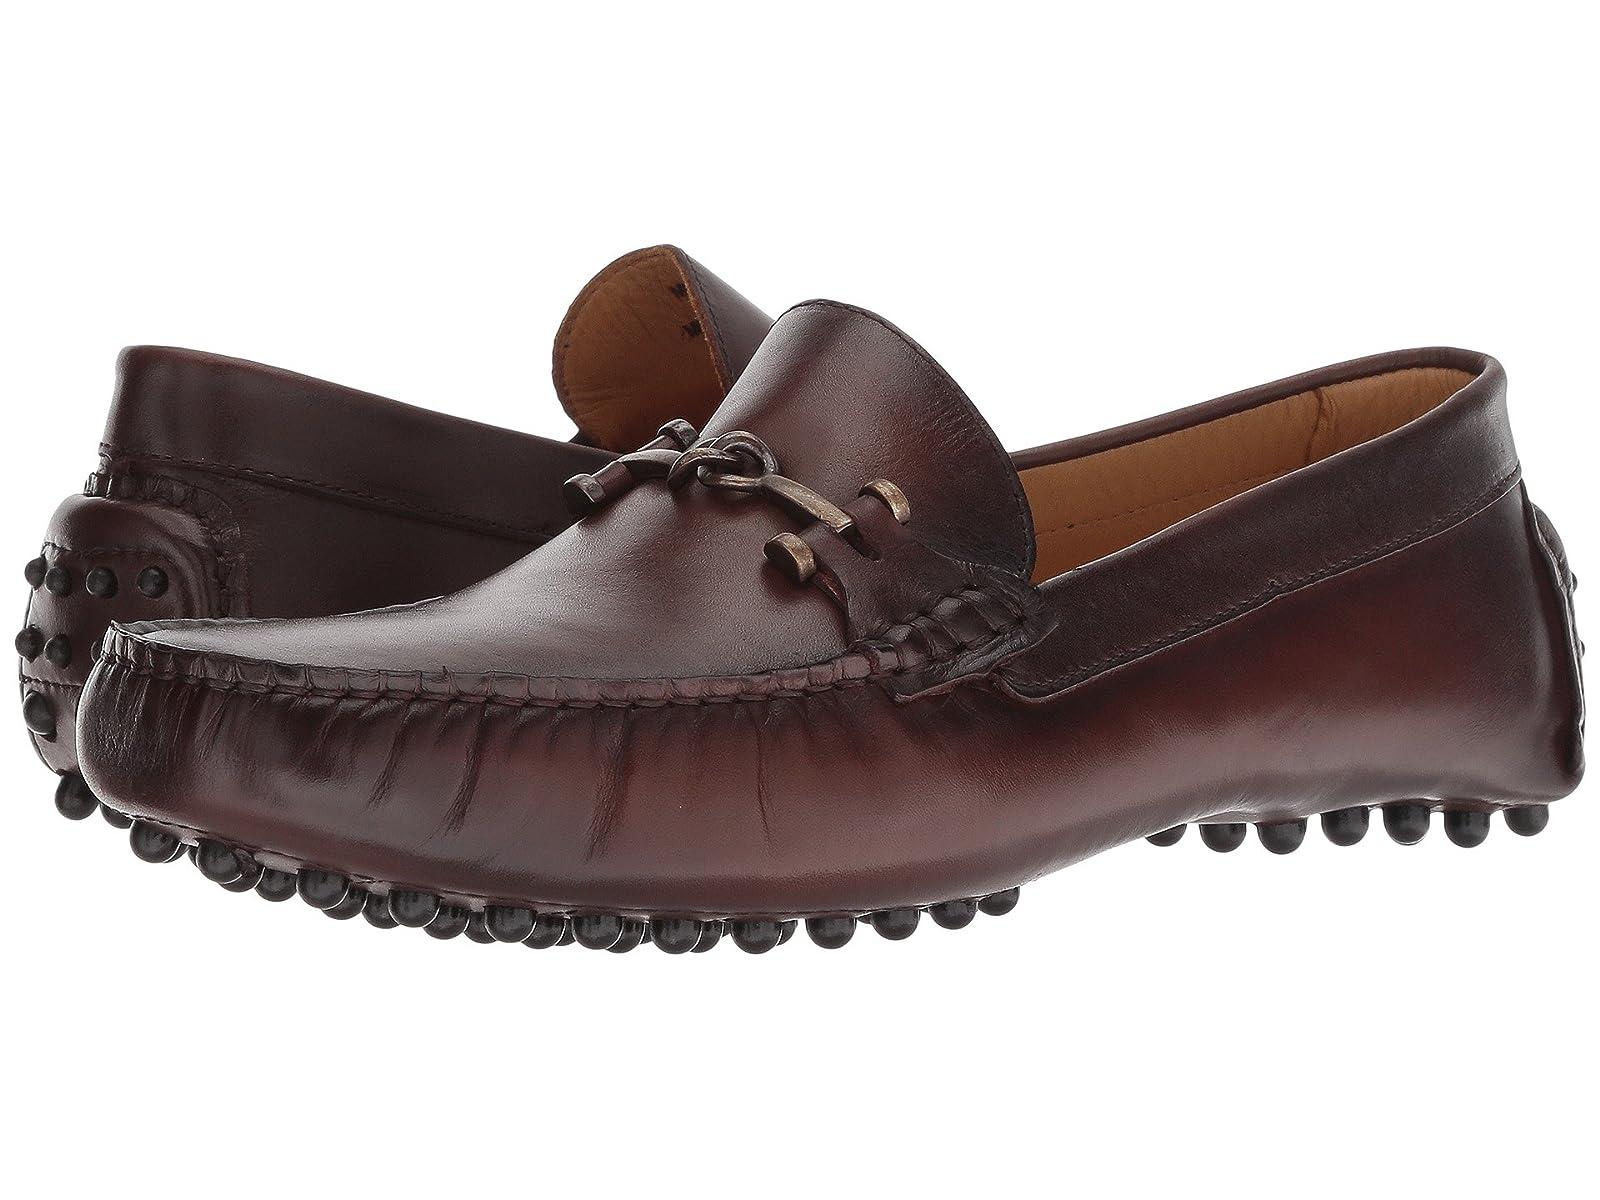 Massimo Matteo Antique Bit DriverAtmospheric grades have affordable shoes